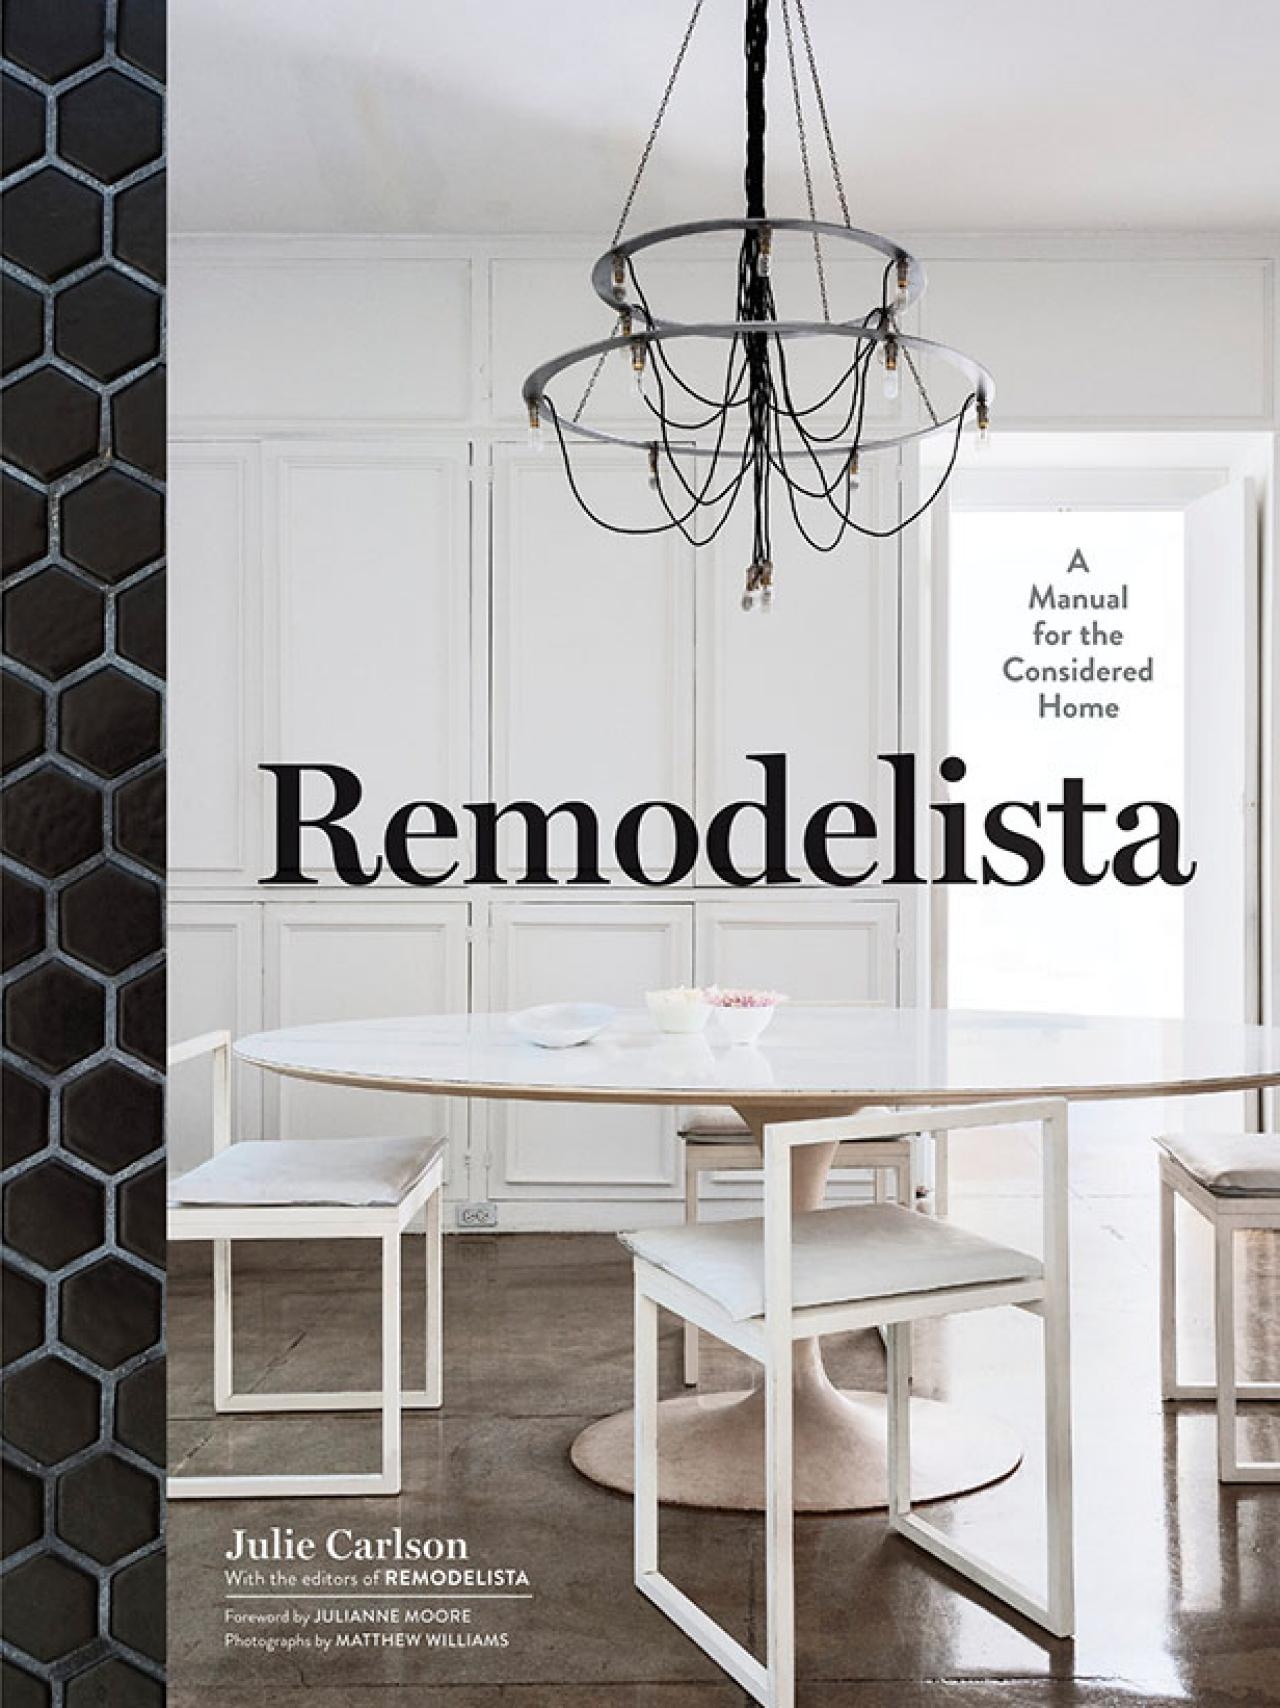 Interior design home book -  Remodelista By Julie Carlson